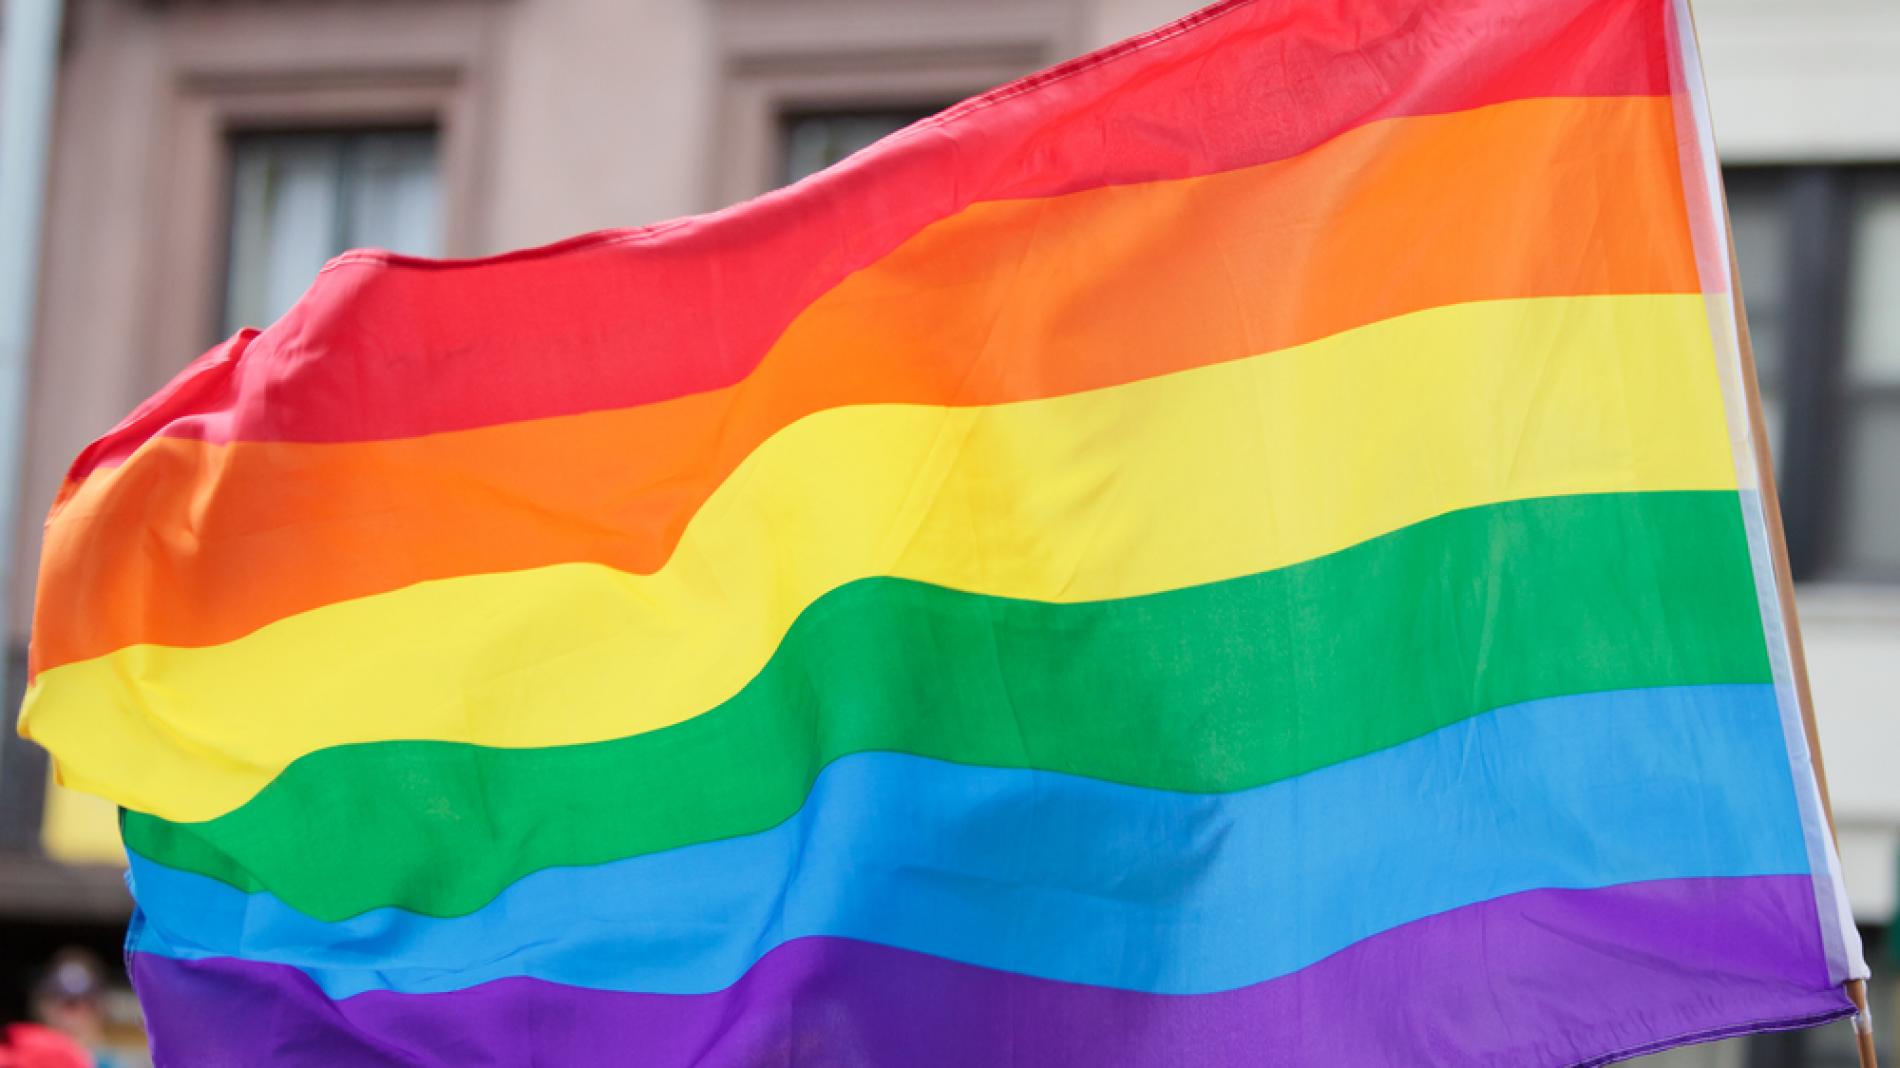 Group holding large pride flag